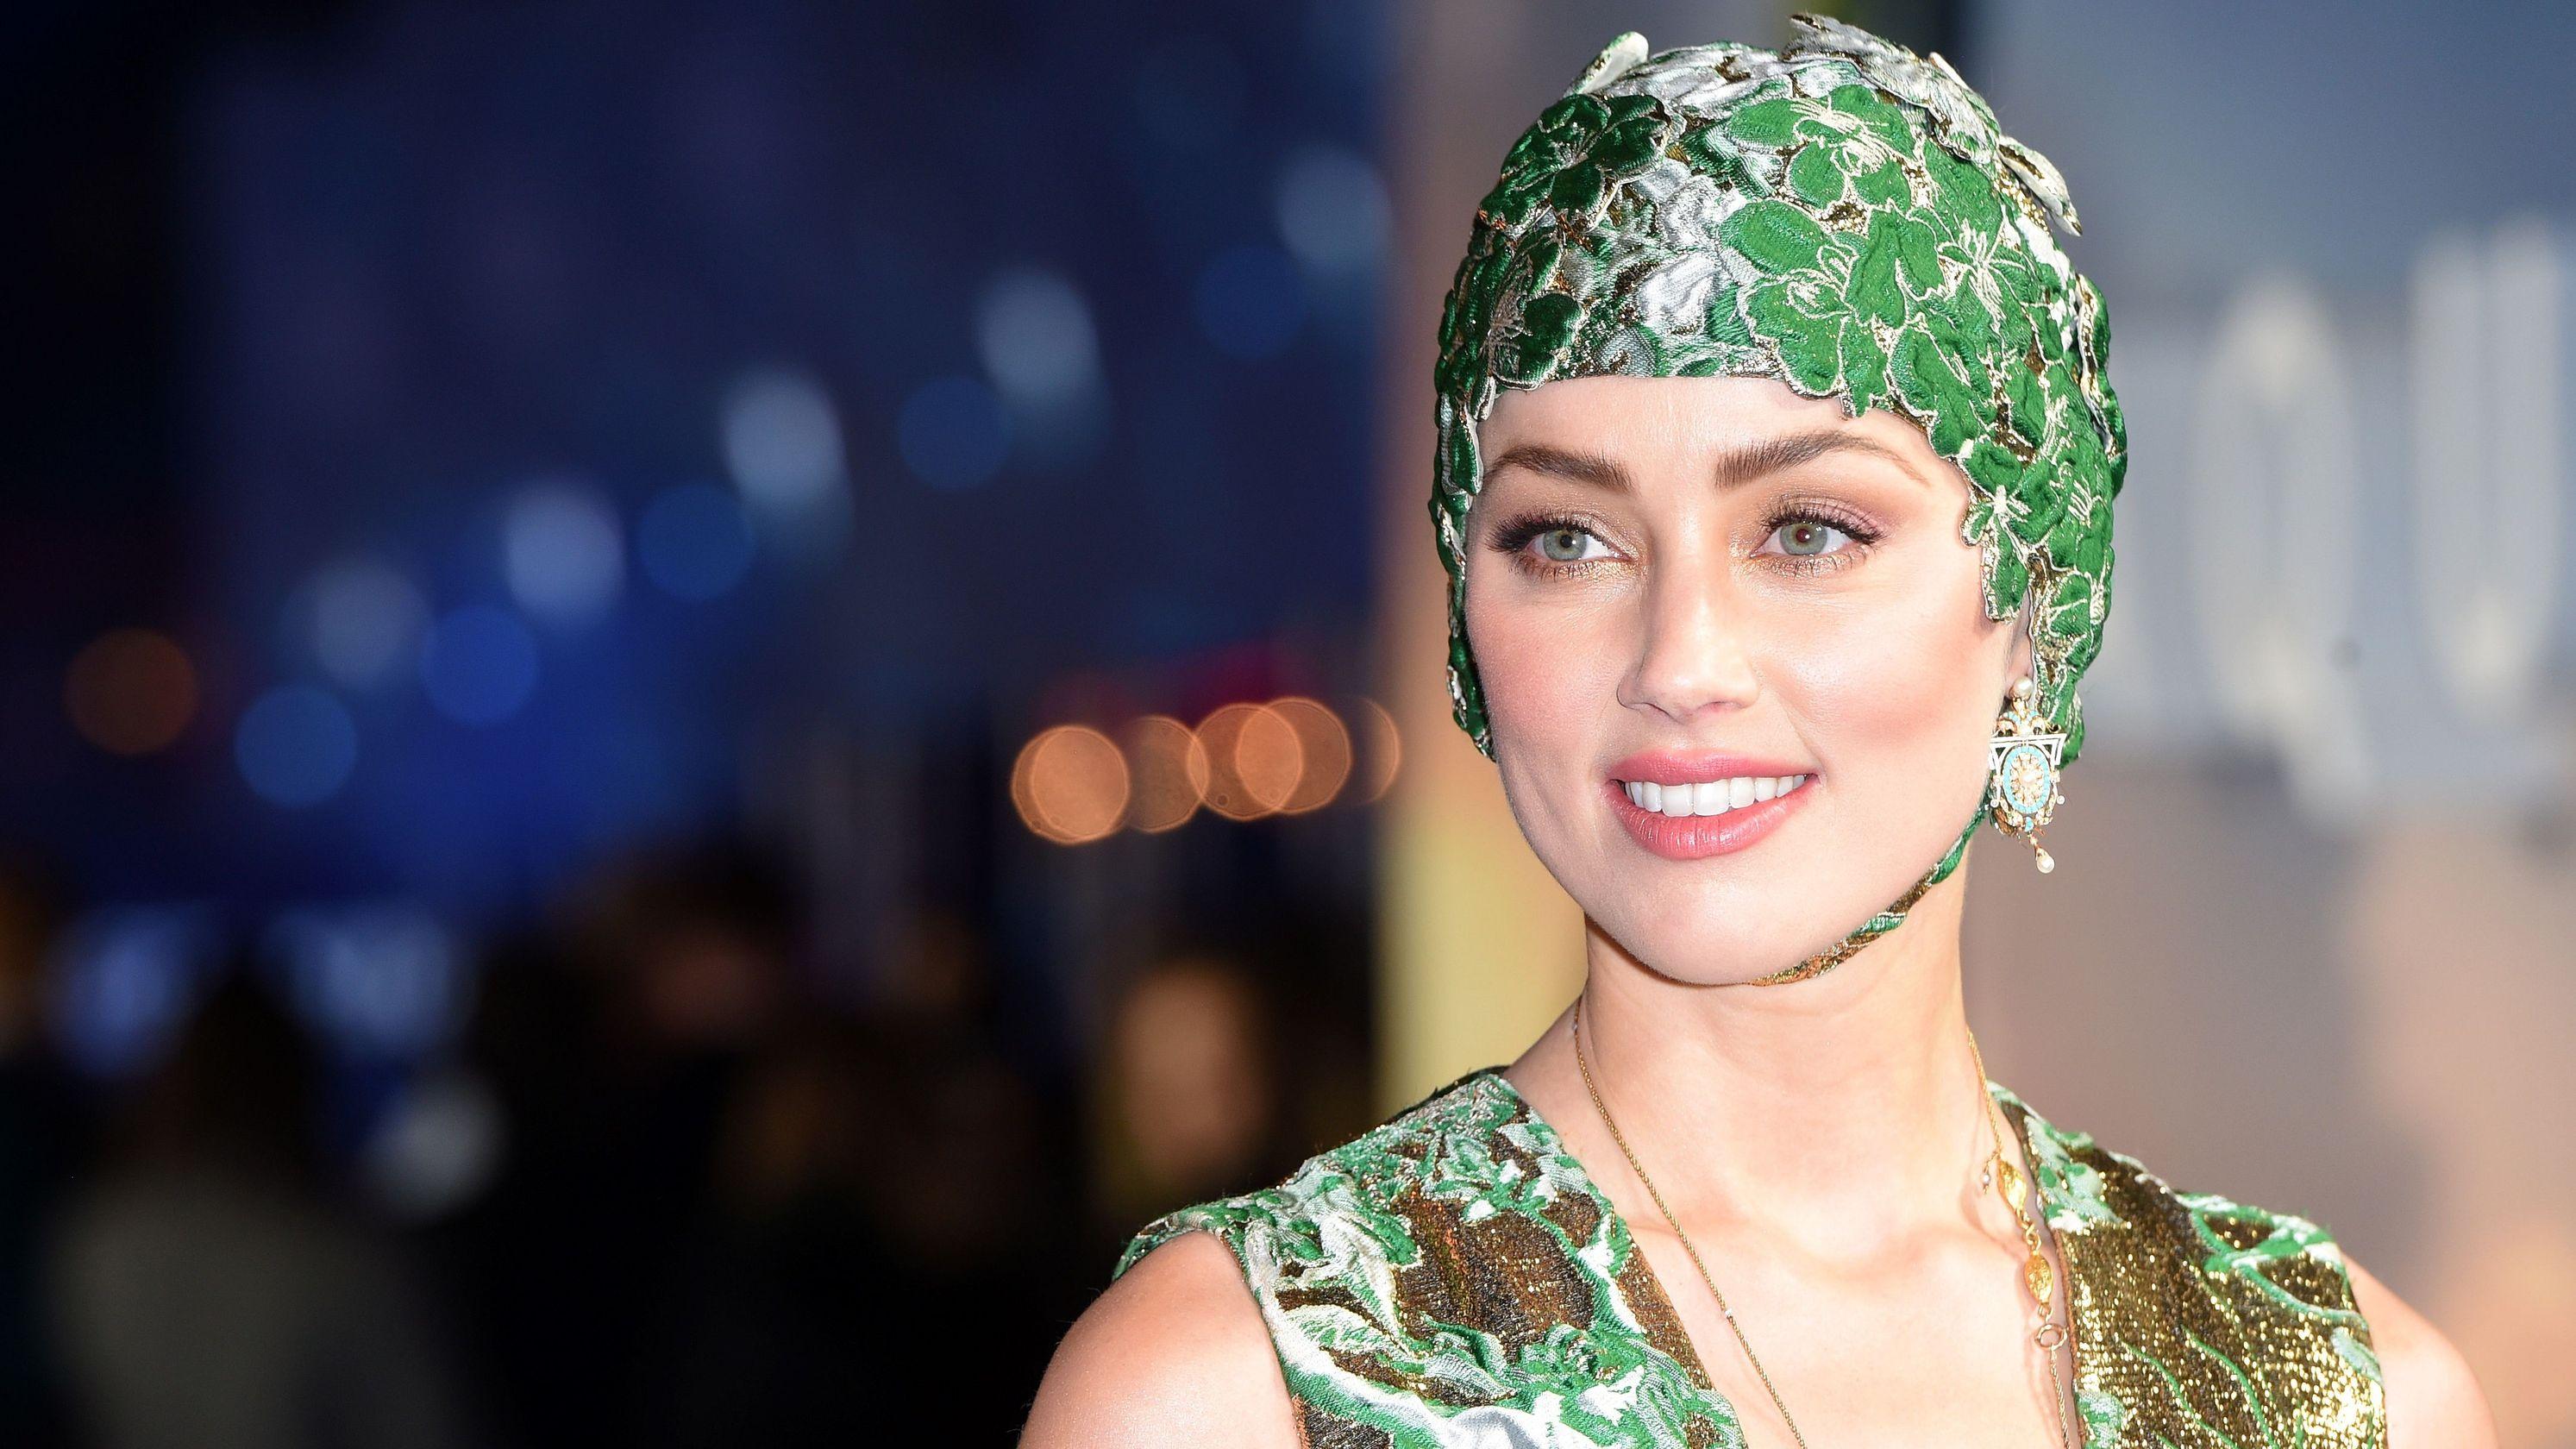 'Aquaman' star Amber Heard laments saying goodbye to her Valentino swim cap